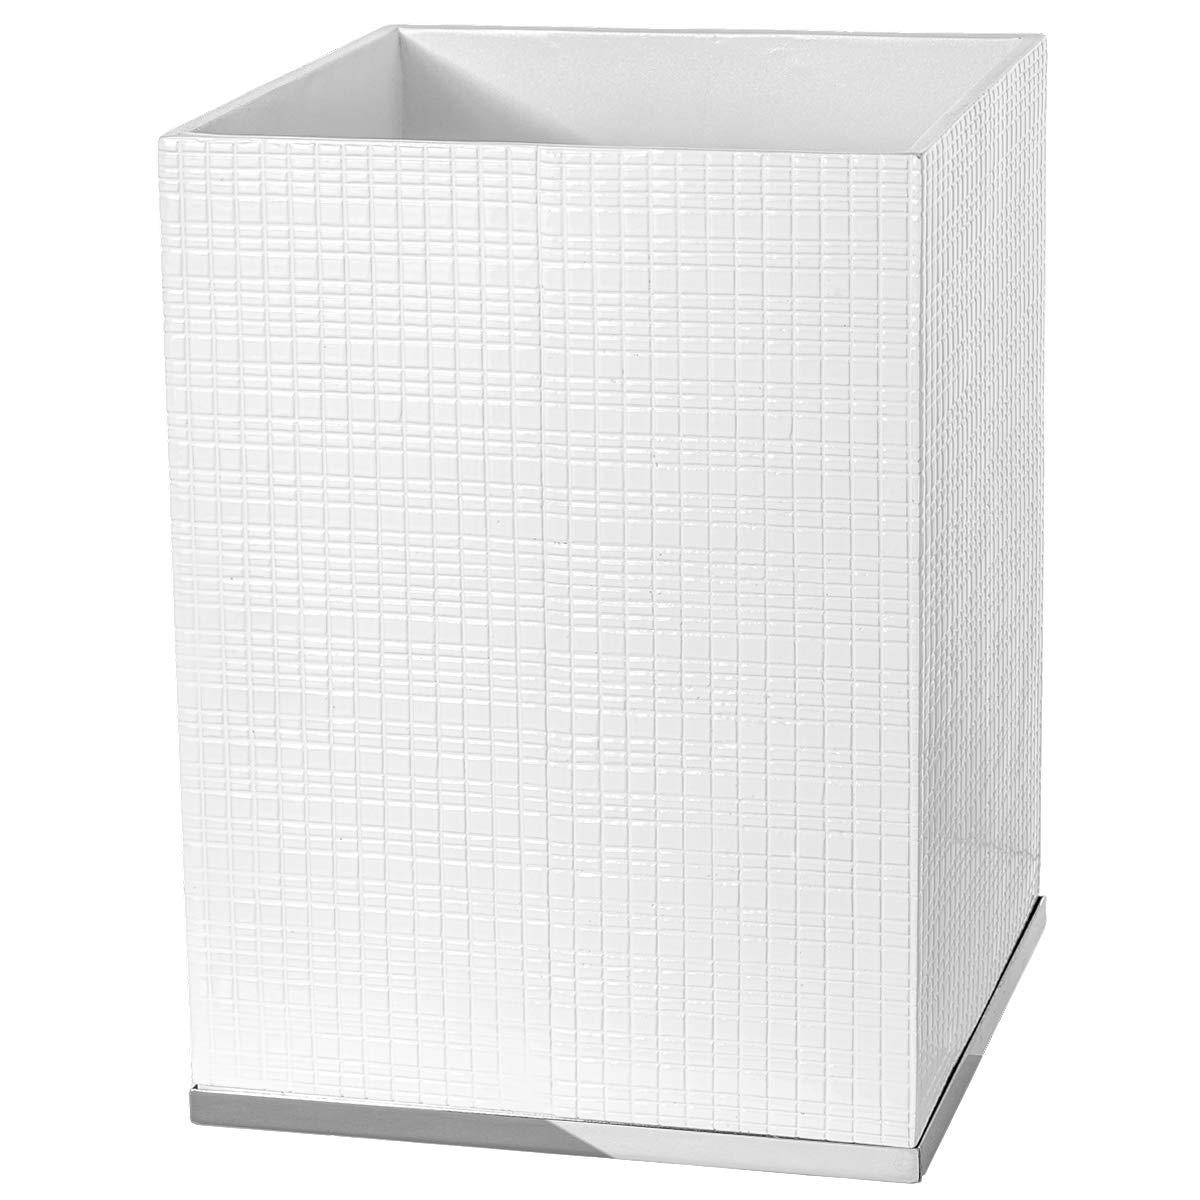 Creative Scents Estella Small White Decorative Bathroom Trash Can - Powder Room Durable Garbage Can Wastebasket Bin for Diaper, Paper, Wips - Space Friendly Bath Waste Basket